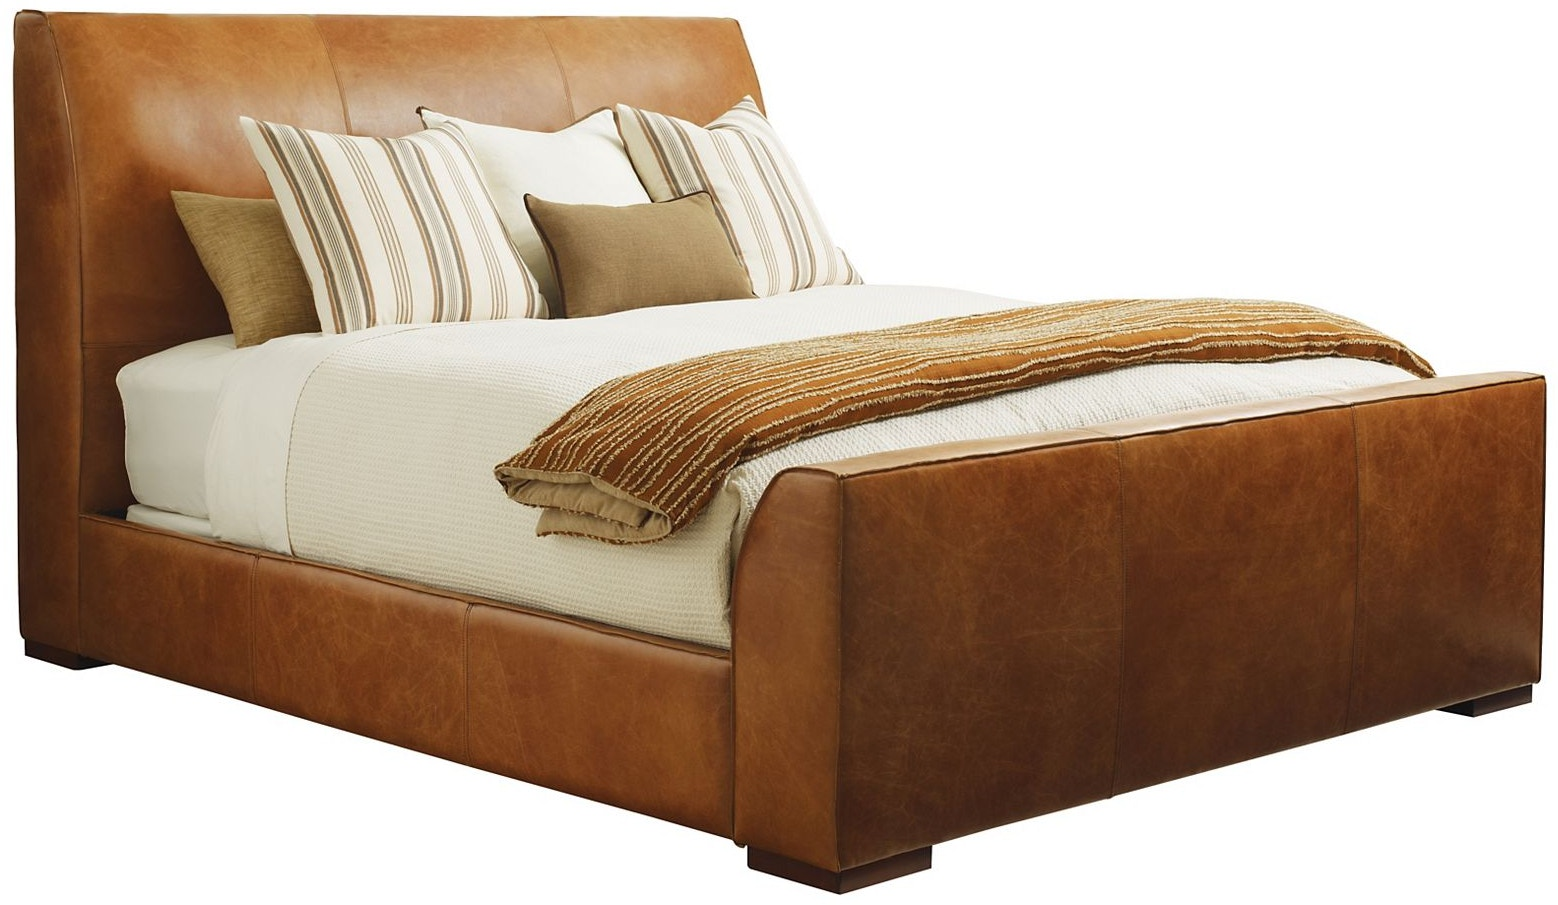 Henredon Furniture IL8866-12 Bedroom Henredon Leather Company ...